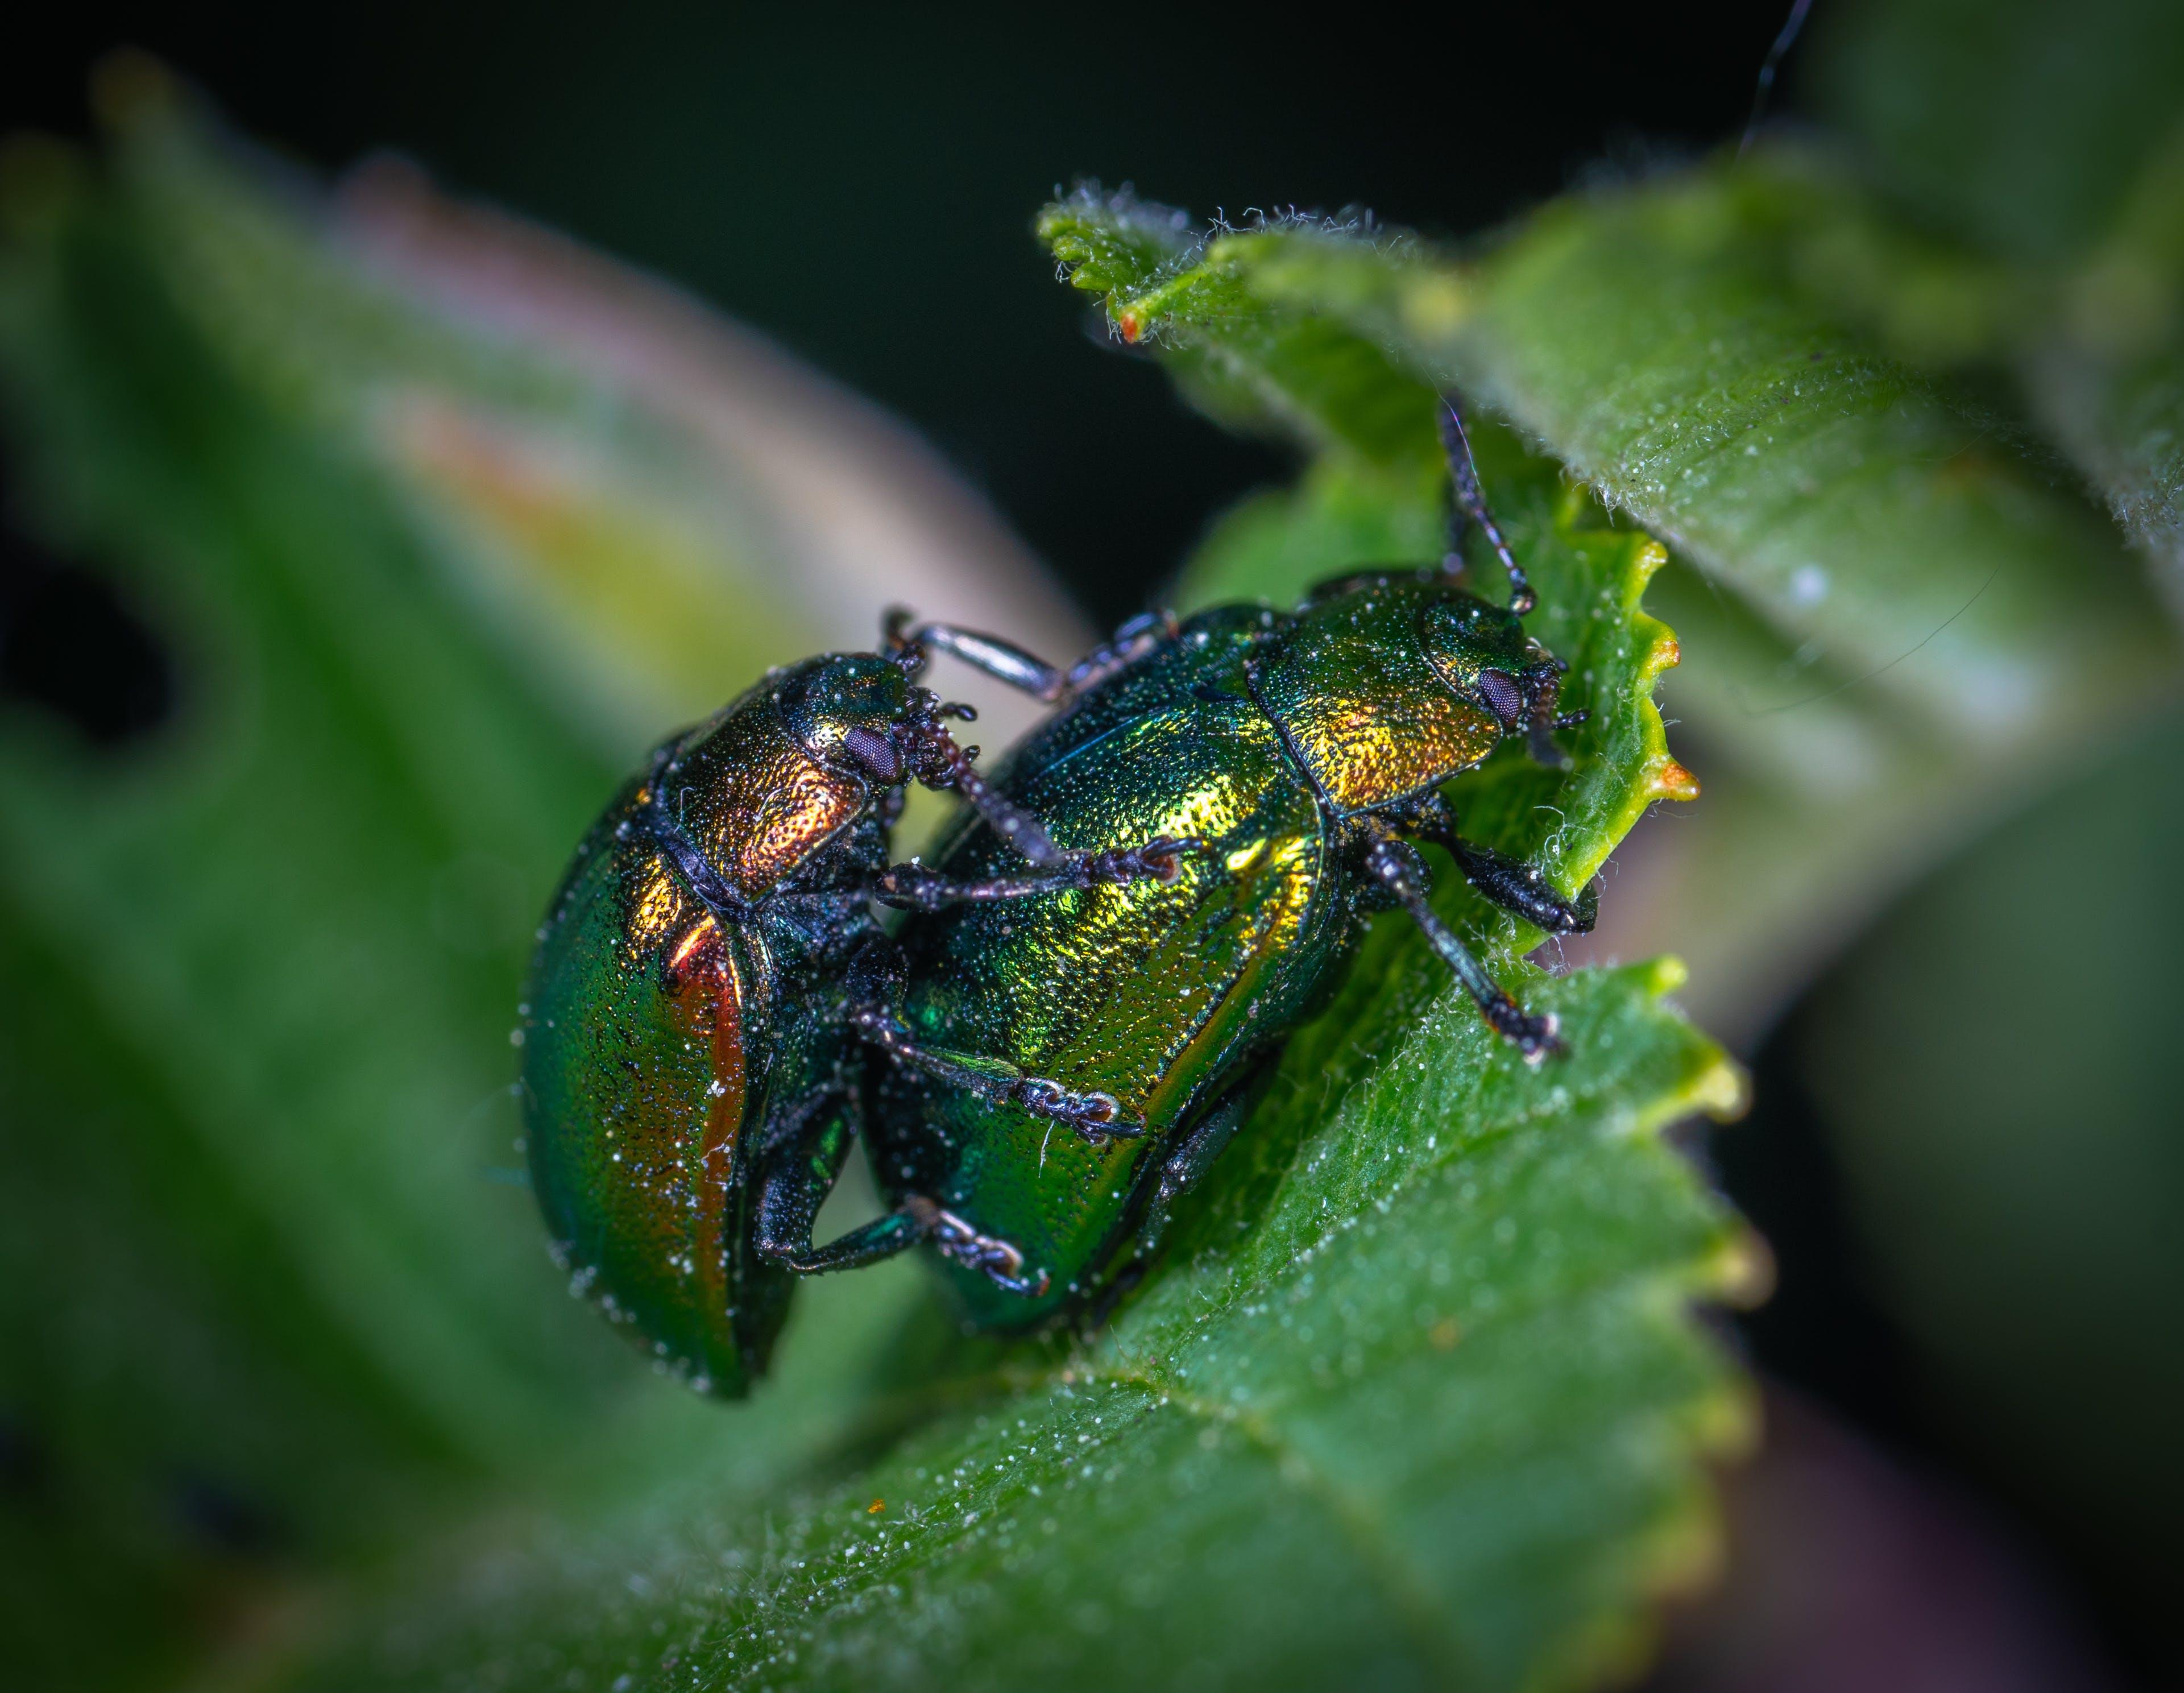 Two Green Beetles on Leaf